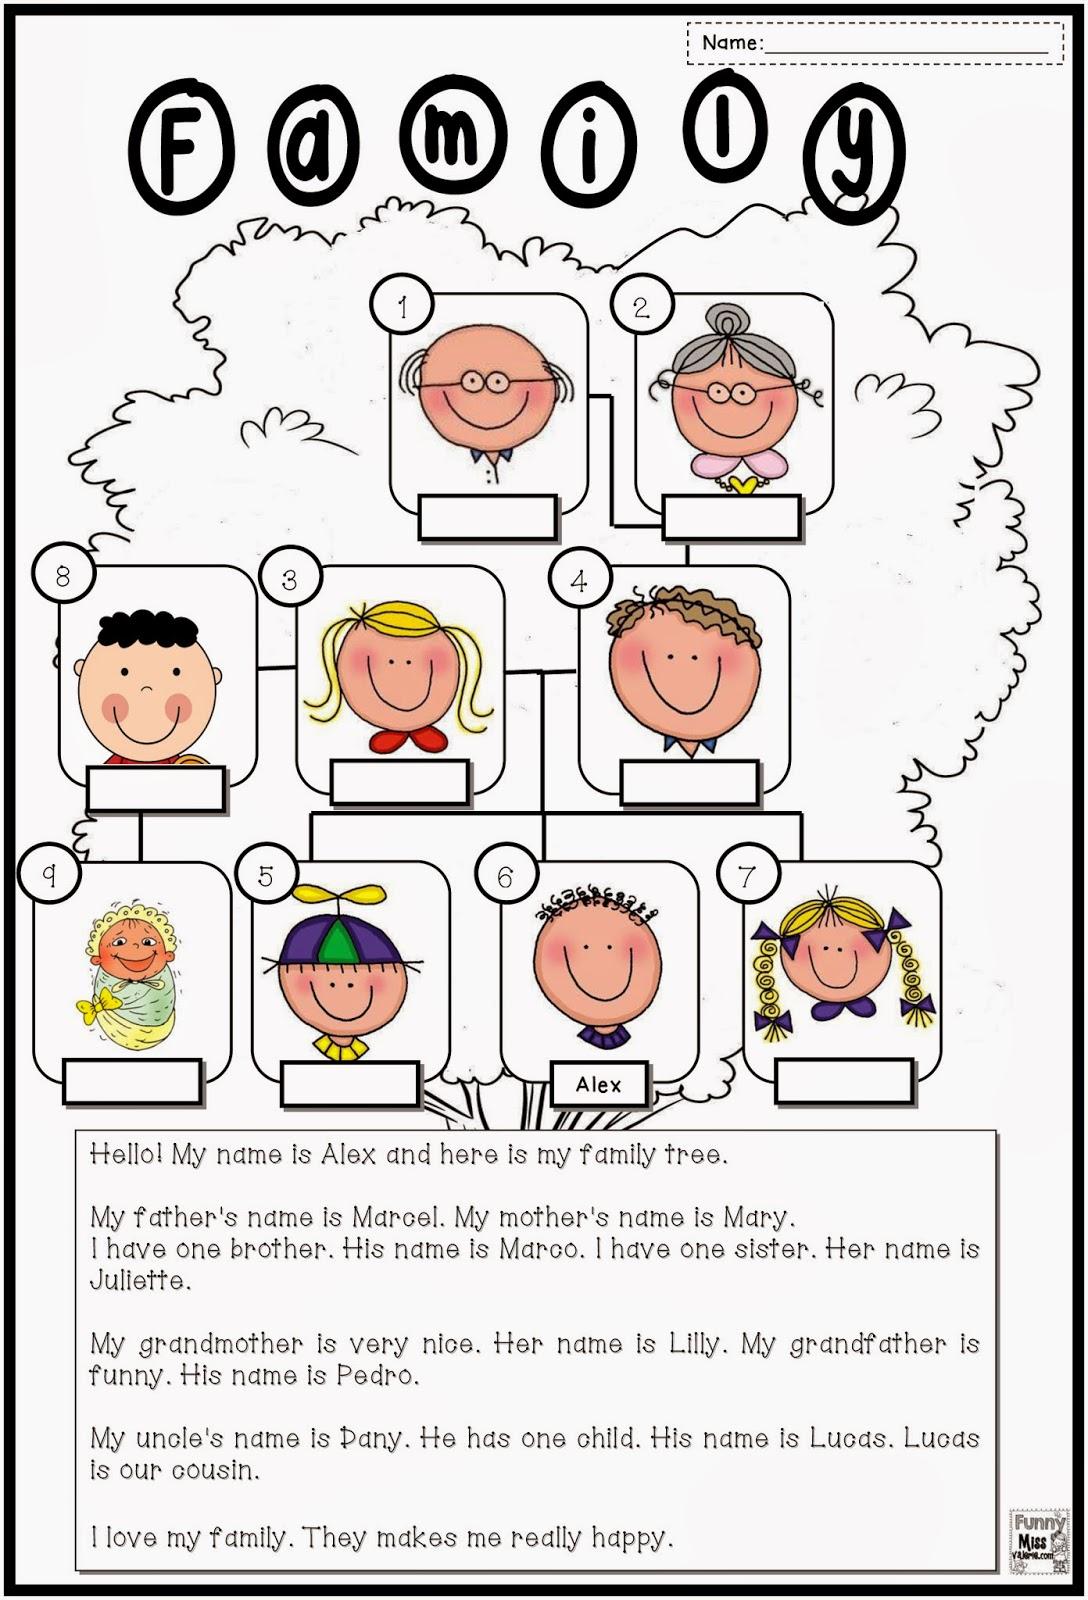 new 266 family tree worksheet for grade 2 family worksheet. Black Bedroom Furniture Sets. Home Design Ideas